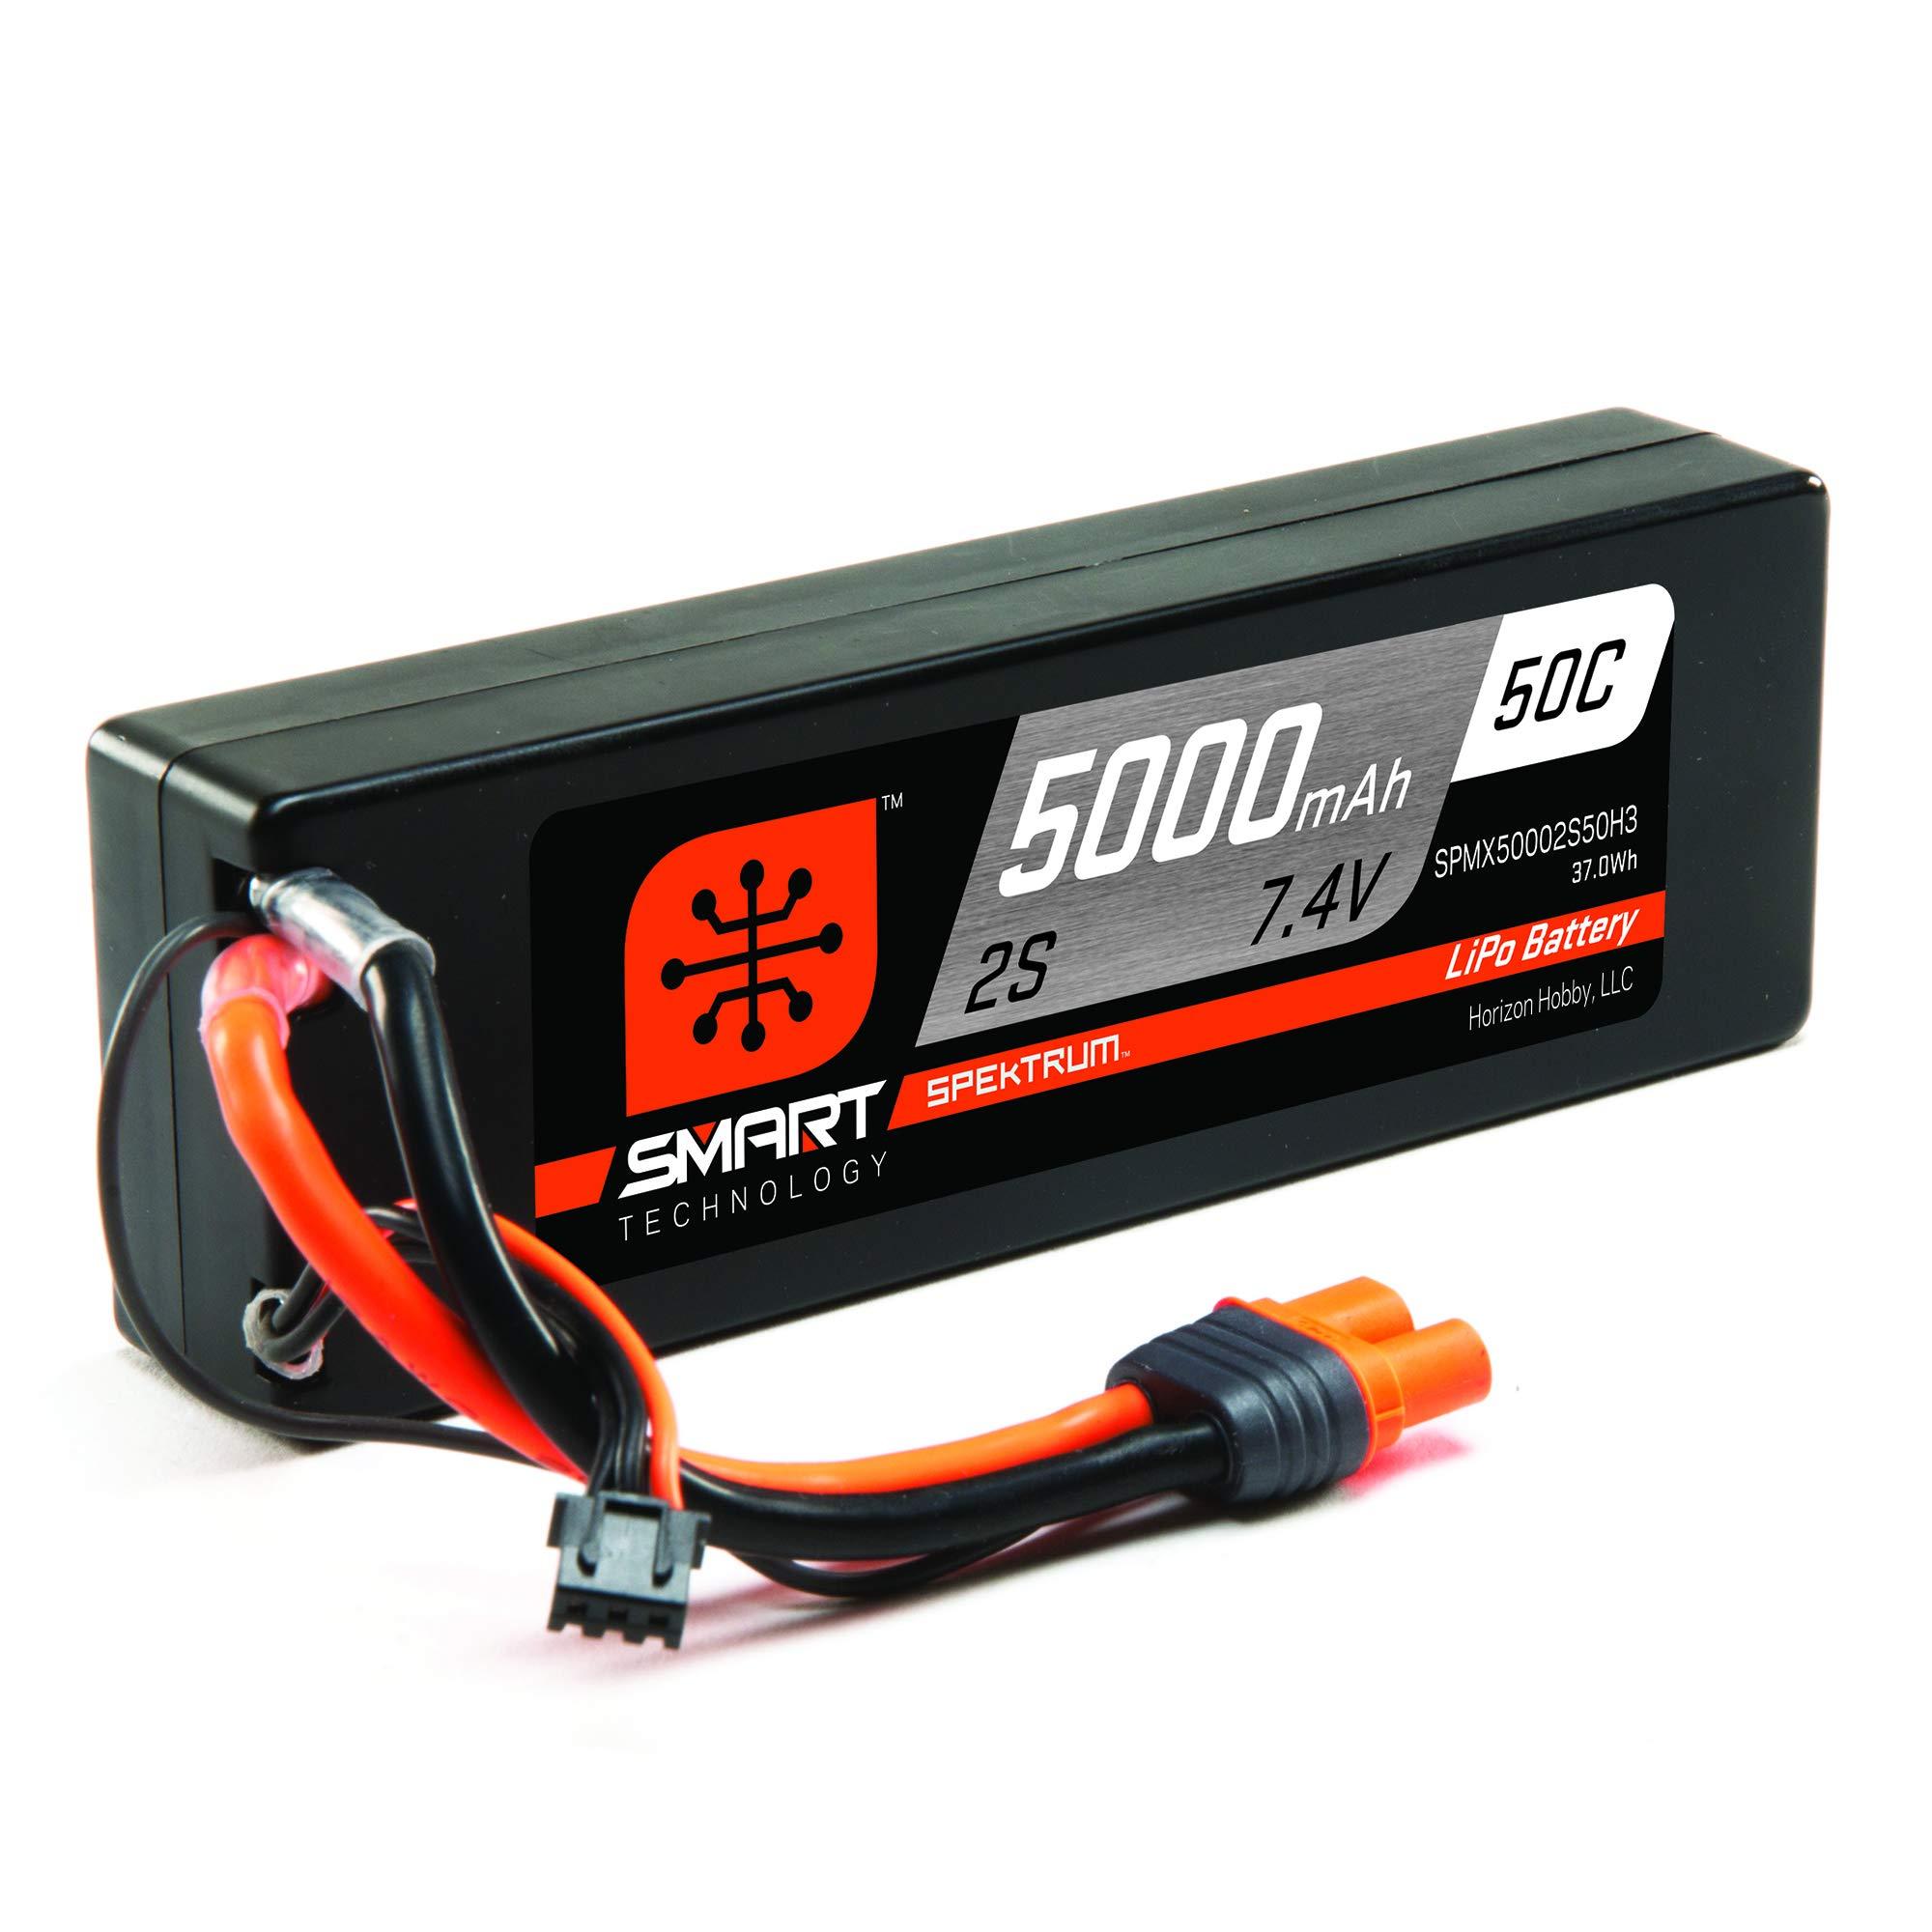 Bateria LIPO 7.4v 5000mah 50C 2S IC3 Spektrum